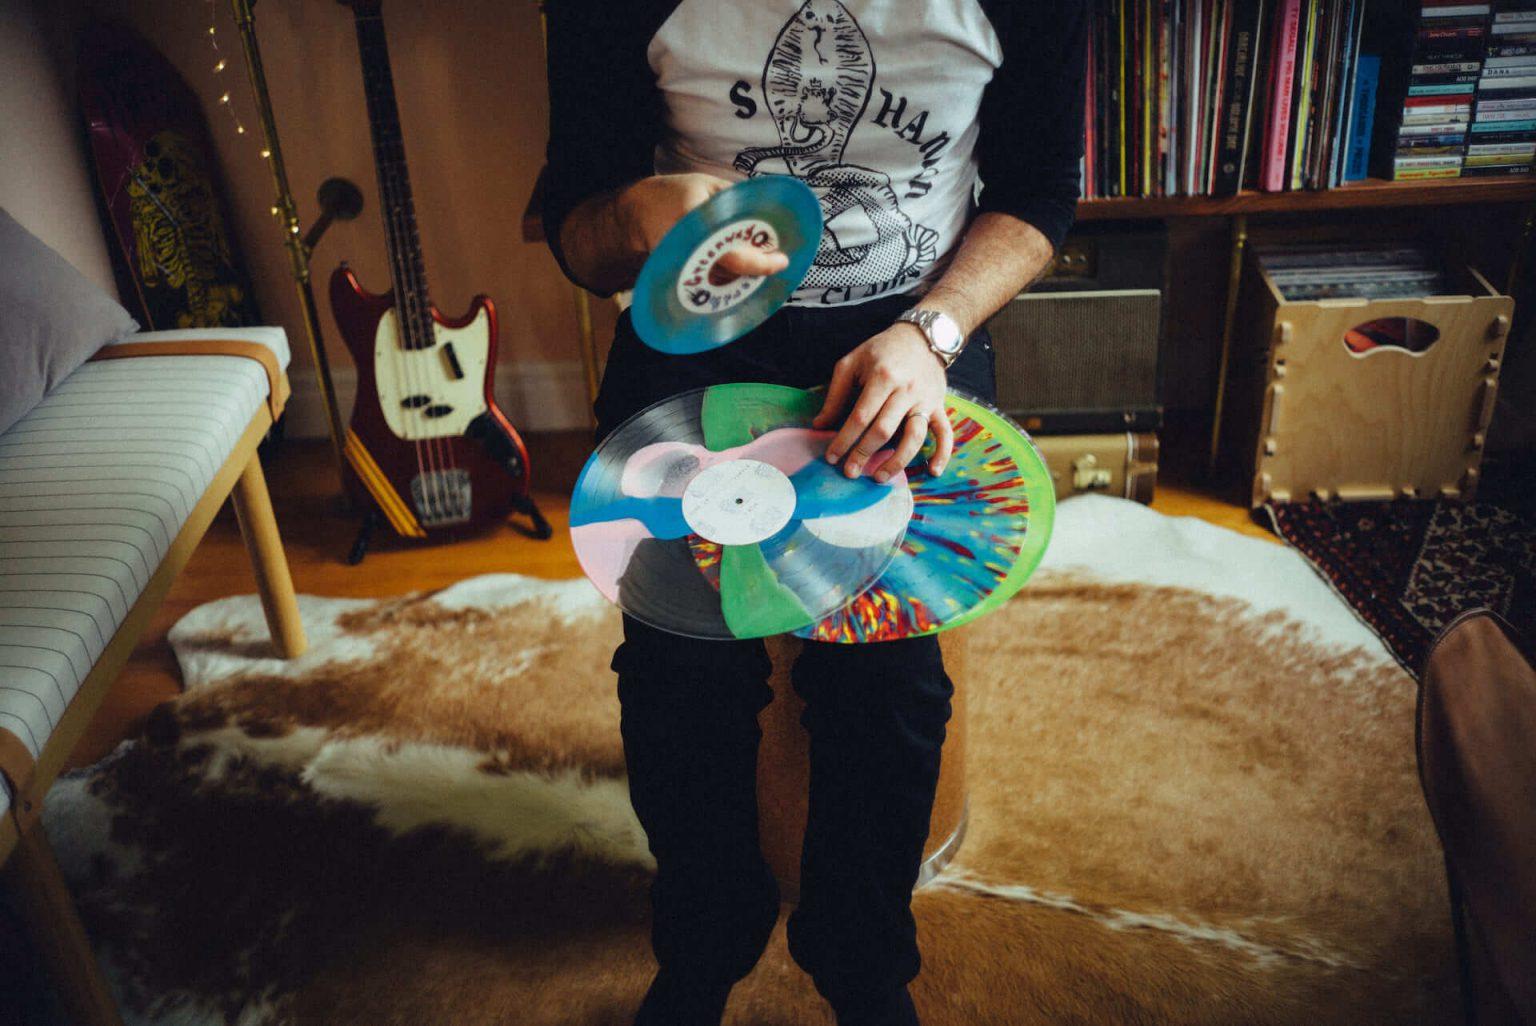 "3_320_AT_Greenwayrecords-1440x962 アナログレコード専門レーベル「Greenway Records」オーナーの""打ち合わせ場所、アイデアの棚、息抜きドーナツ屋、最近のベニュー"""